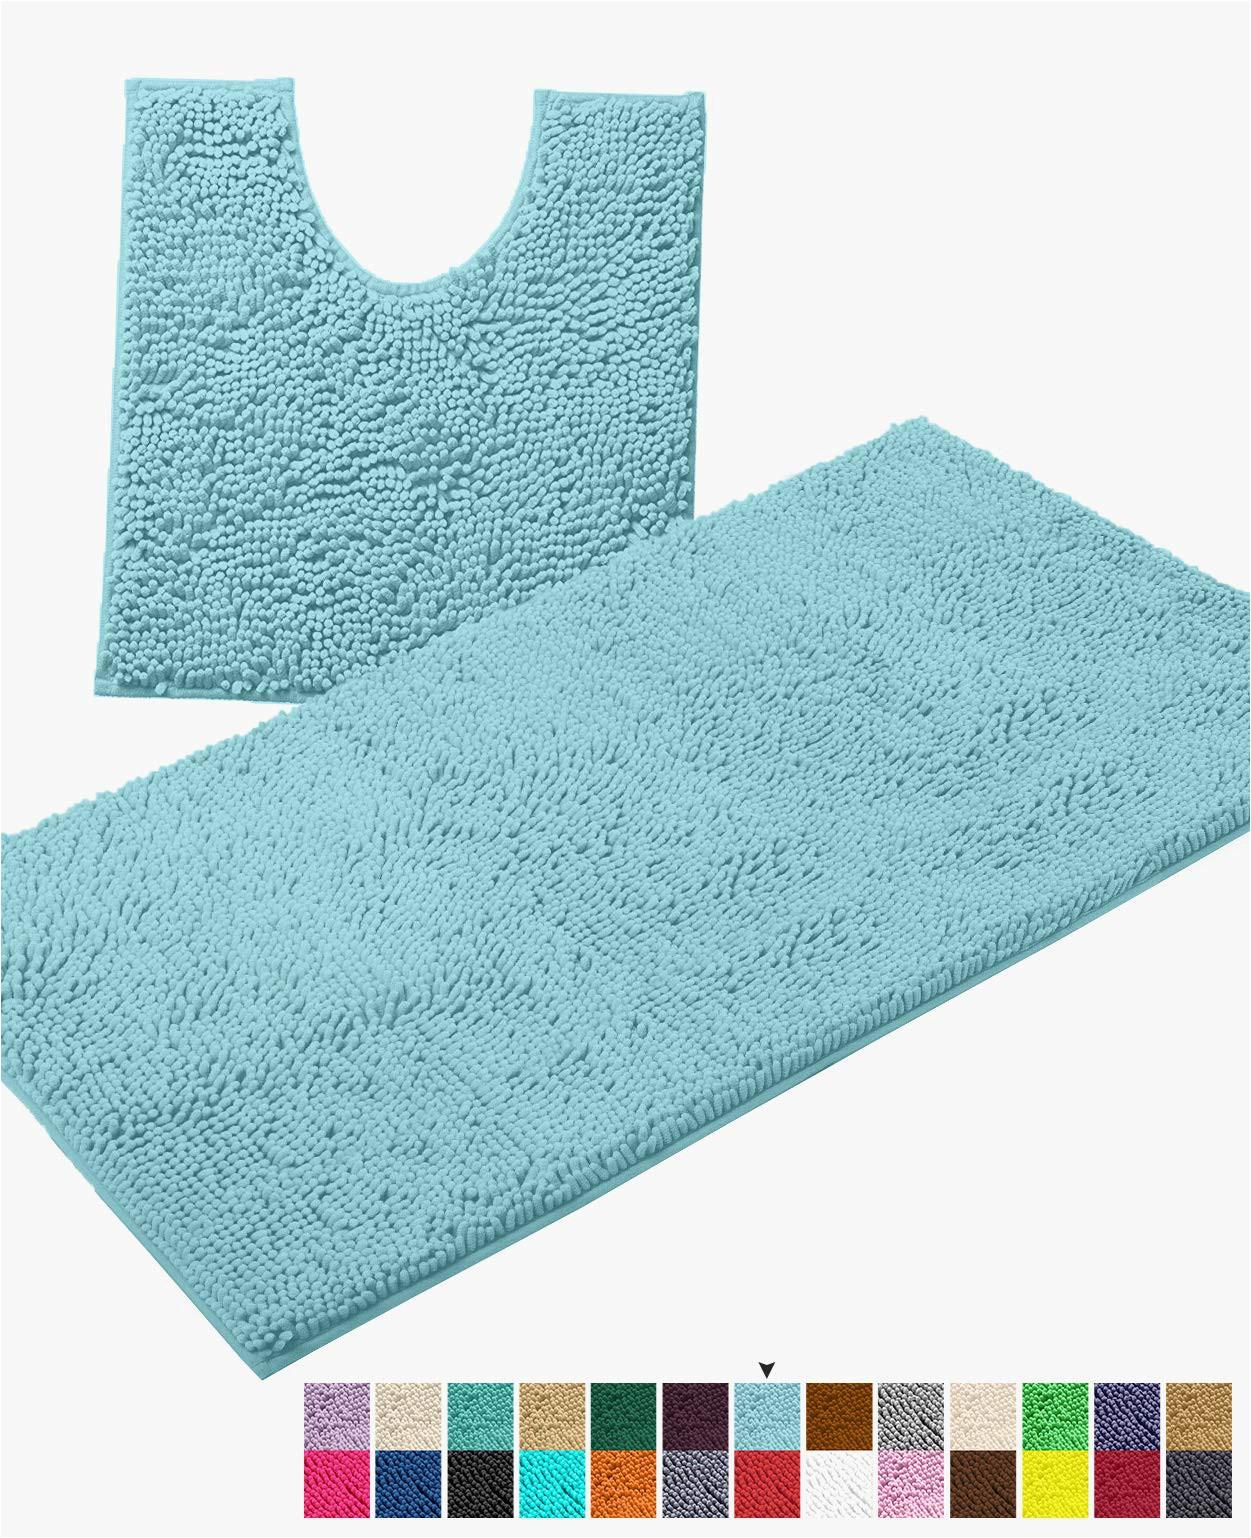 Large Chenille Bathroom Rugs Luxurux Bathroom Rugs Luxury Chenille 2 Piece Bath Mat Set